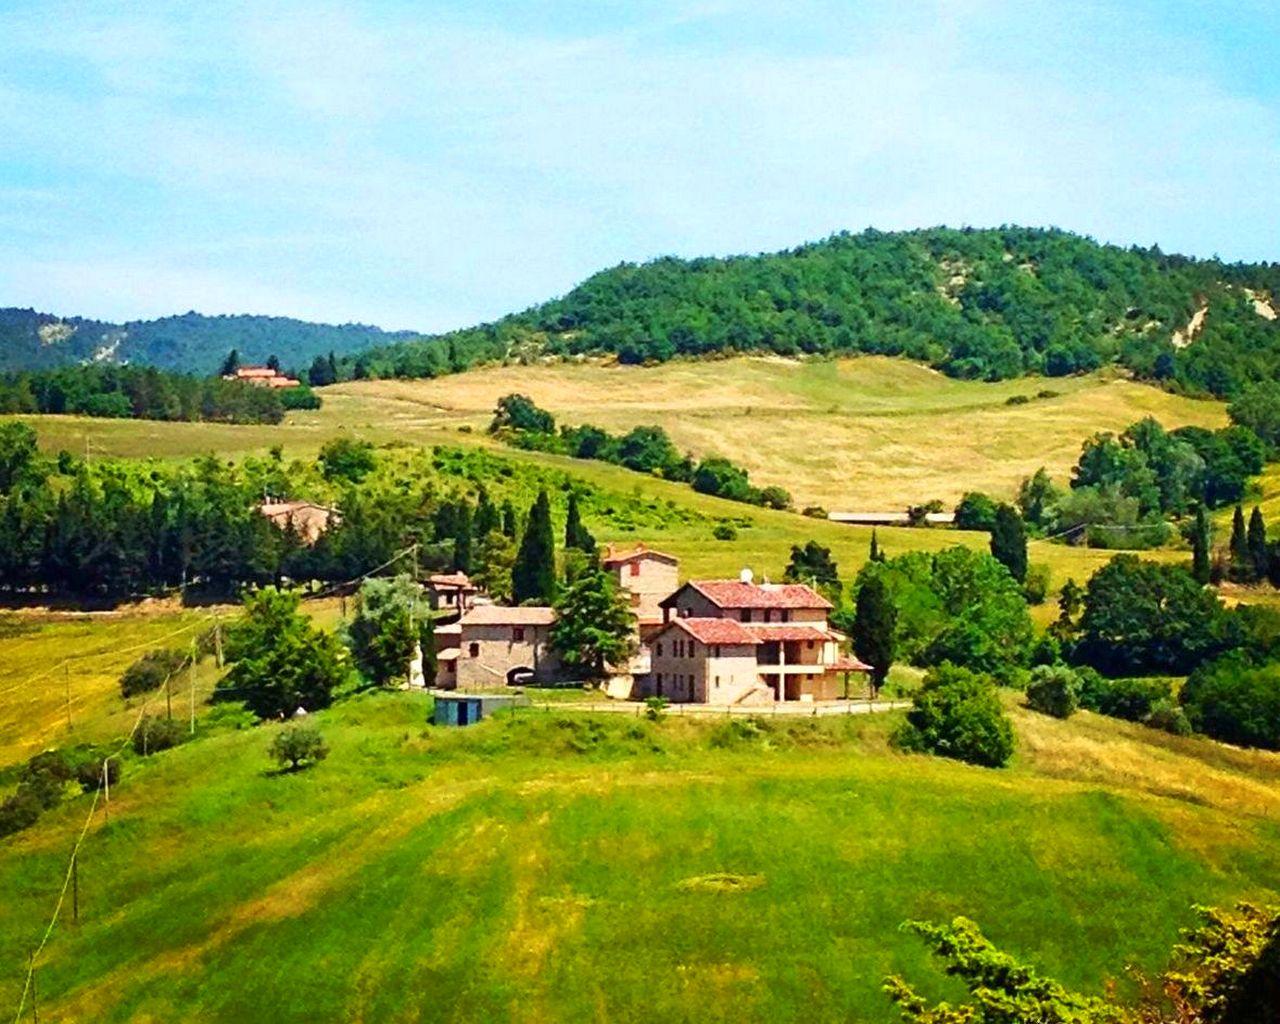 santa-felicita-paterna-turismo-umbria-agriturismo-vacanza-country-house-0-100_6